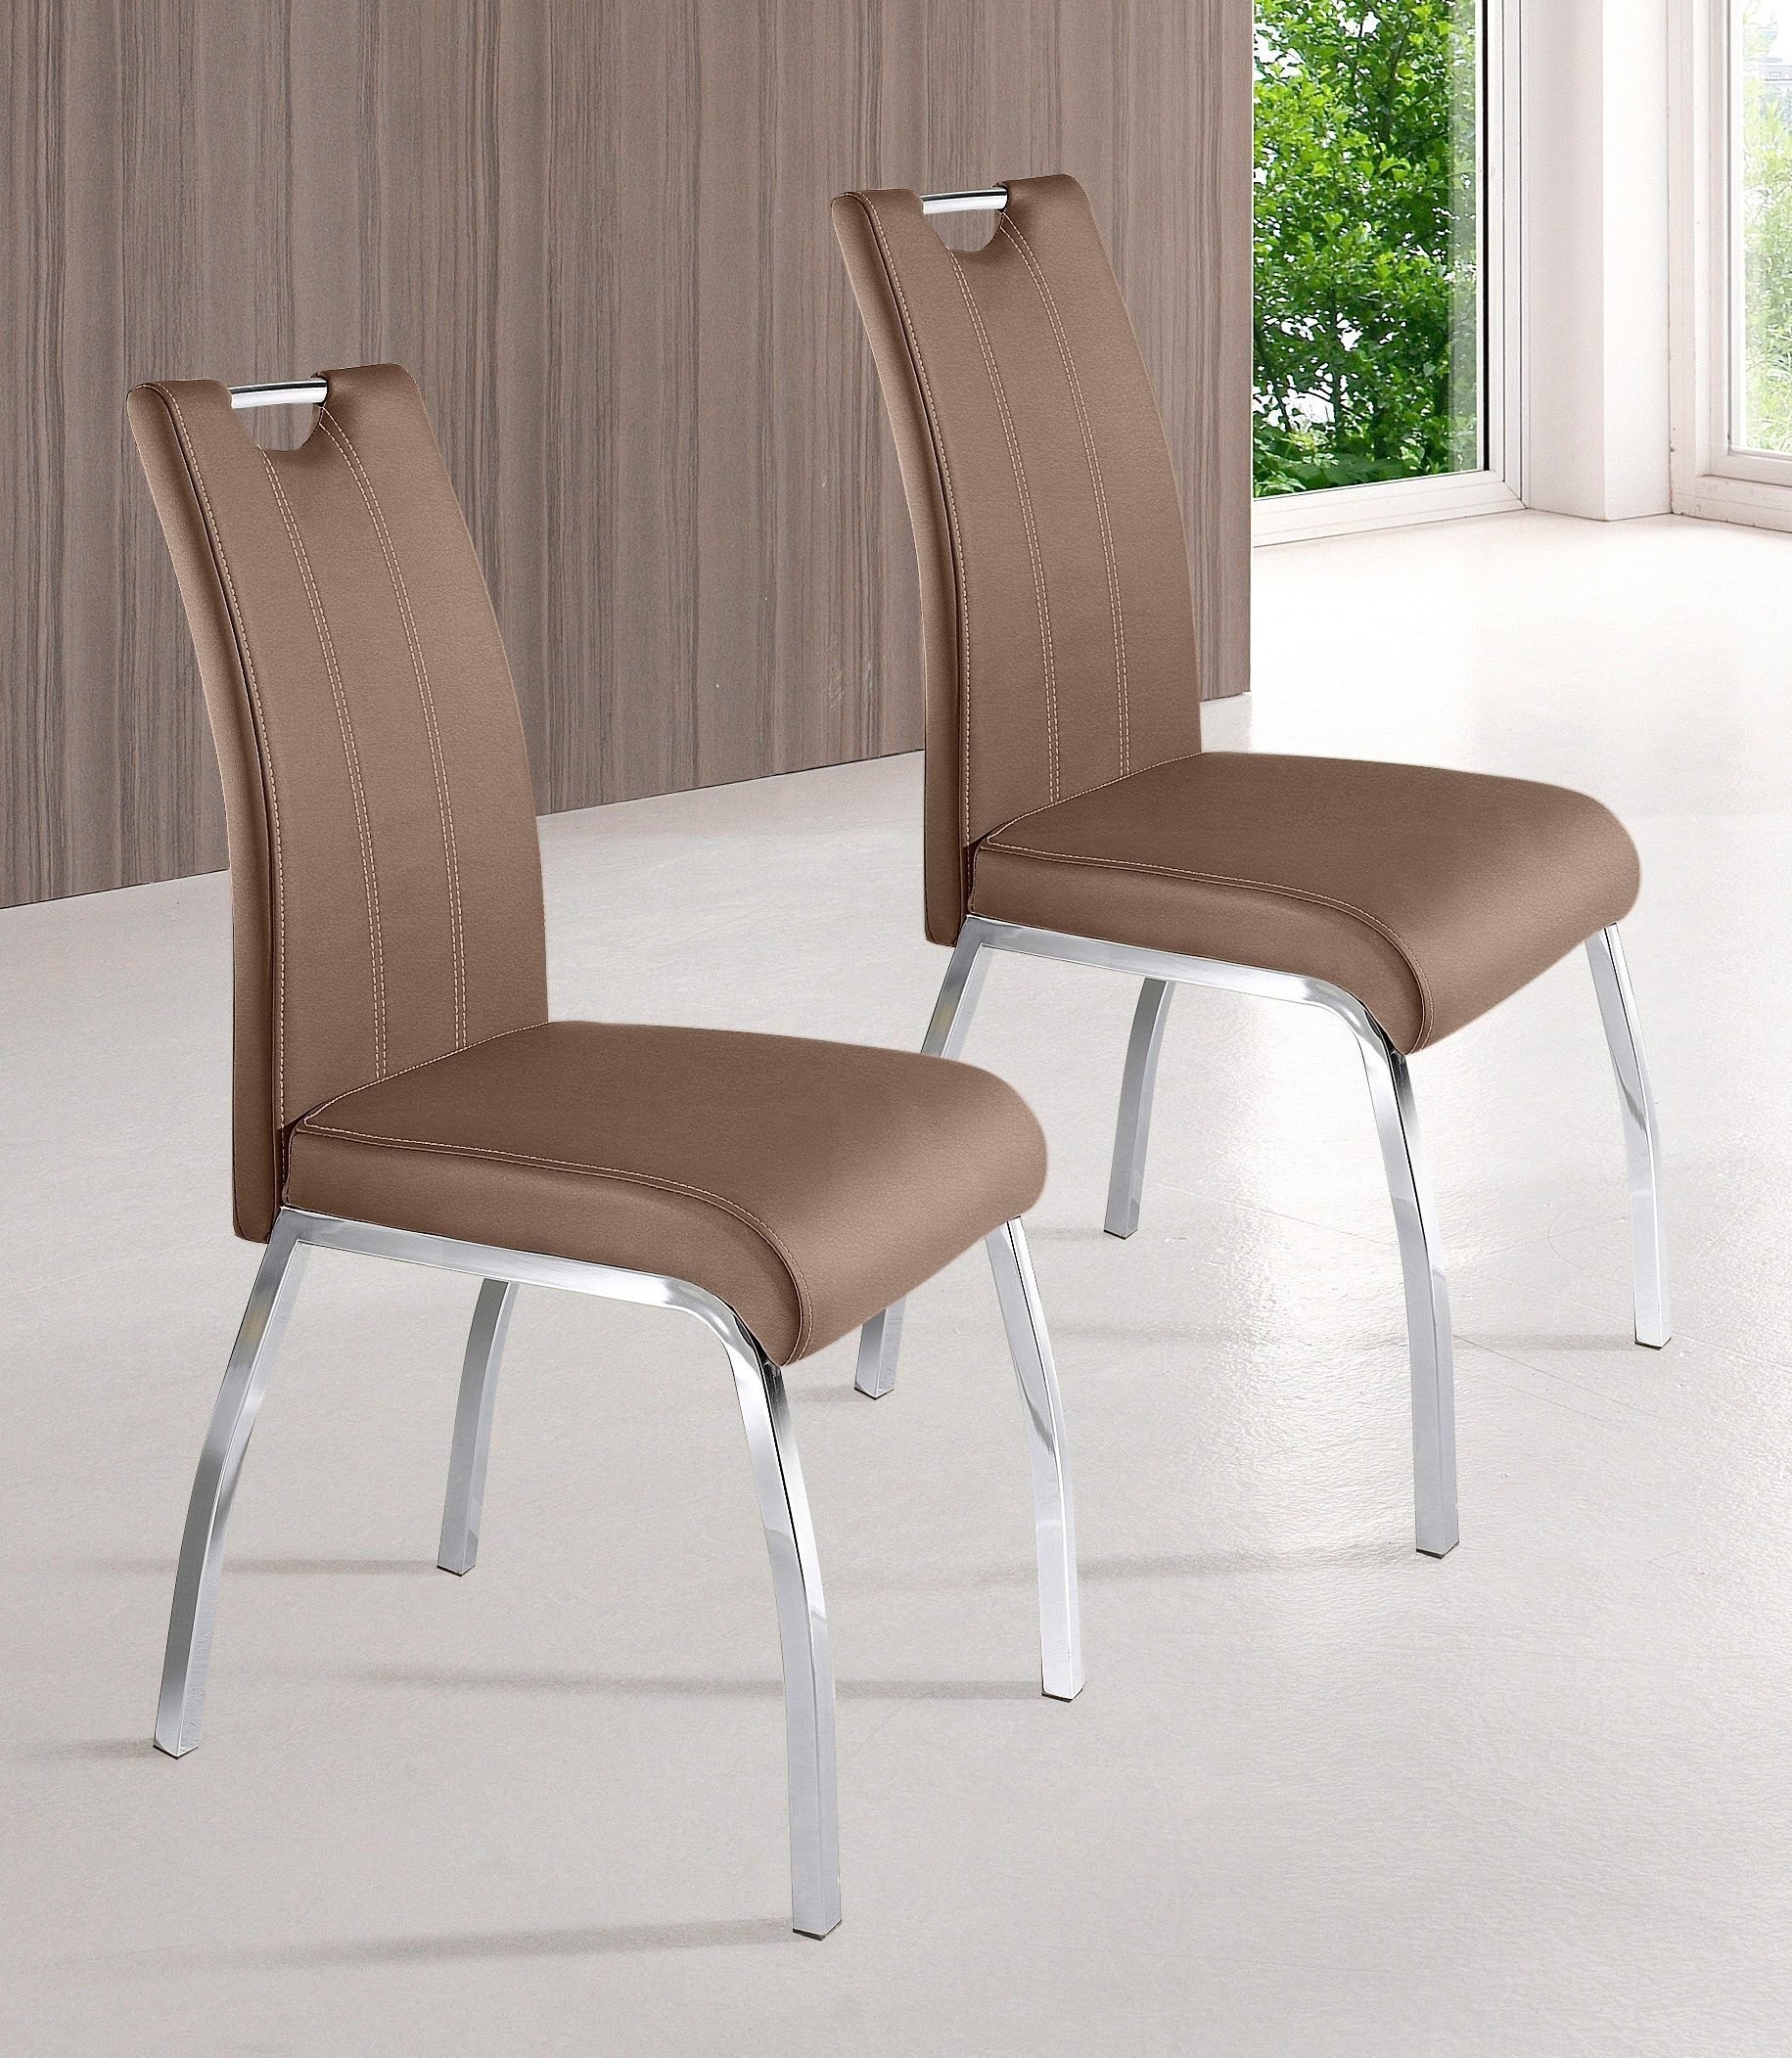 Stühle (2 Stck.) beige, Gestell Vierfuß chrom, Kunstleder ...